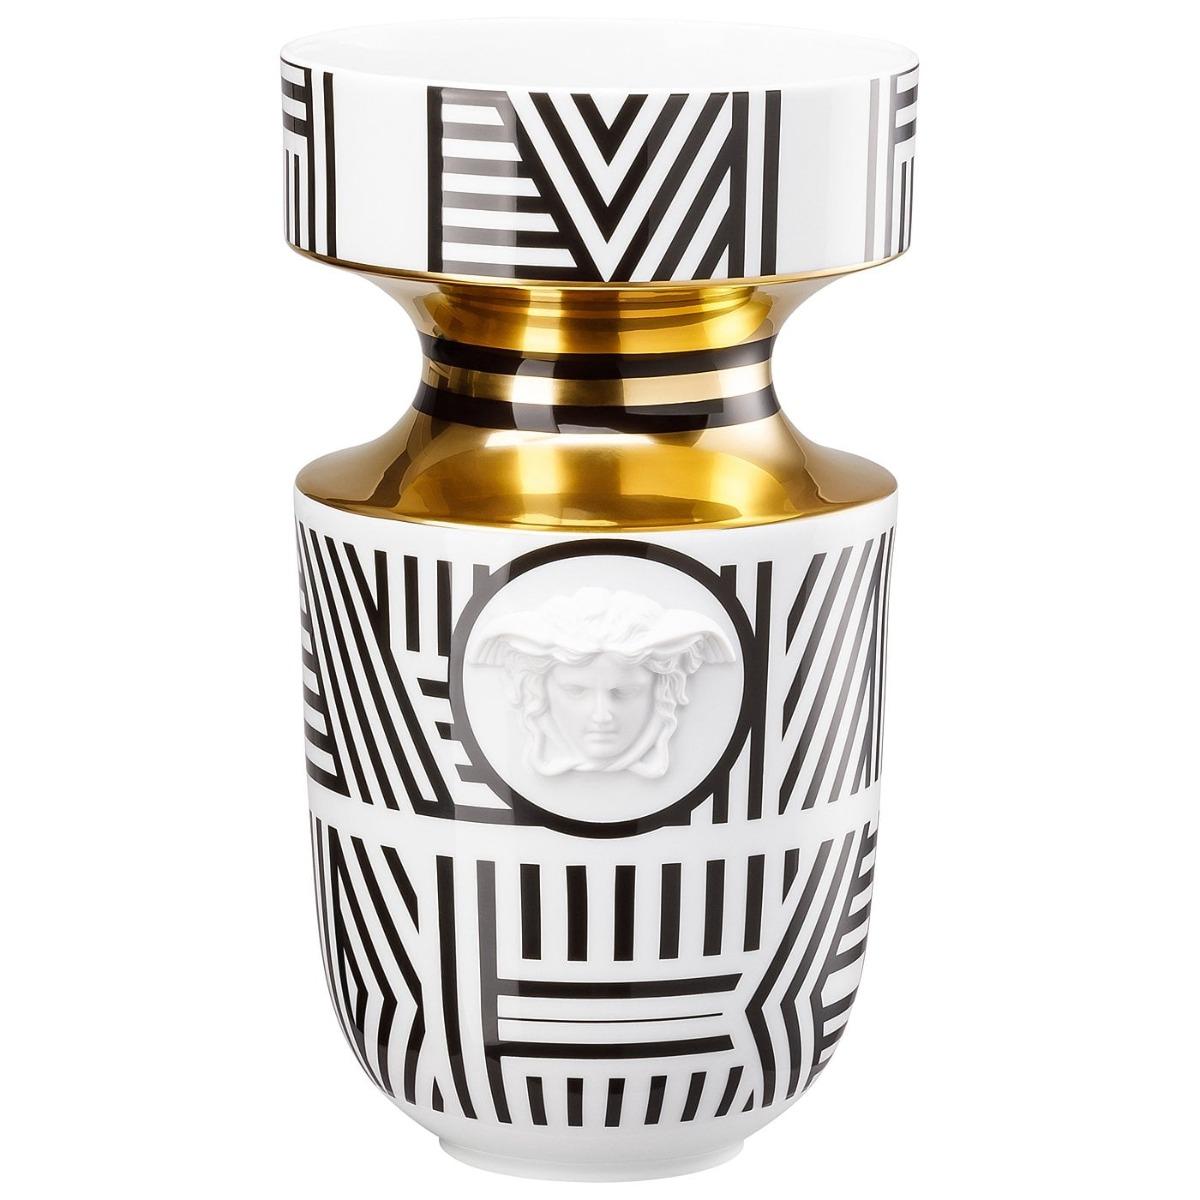 Nymph Vases Gold Edition Vase 33 cm